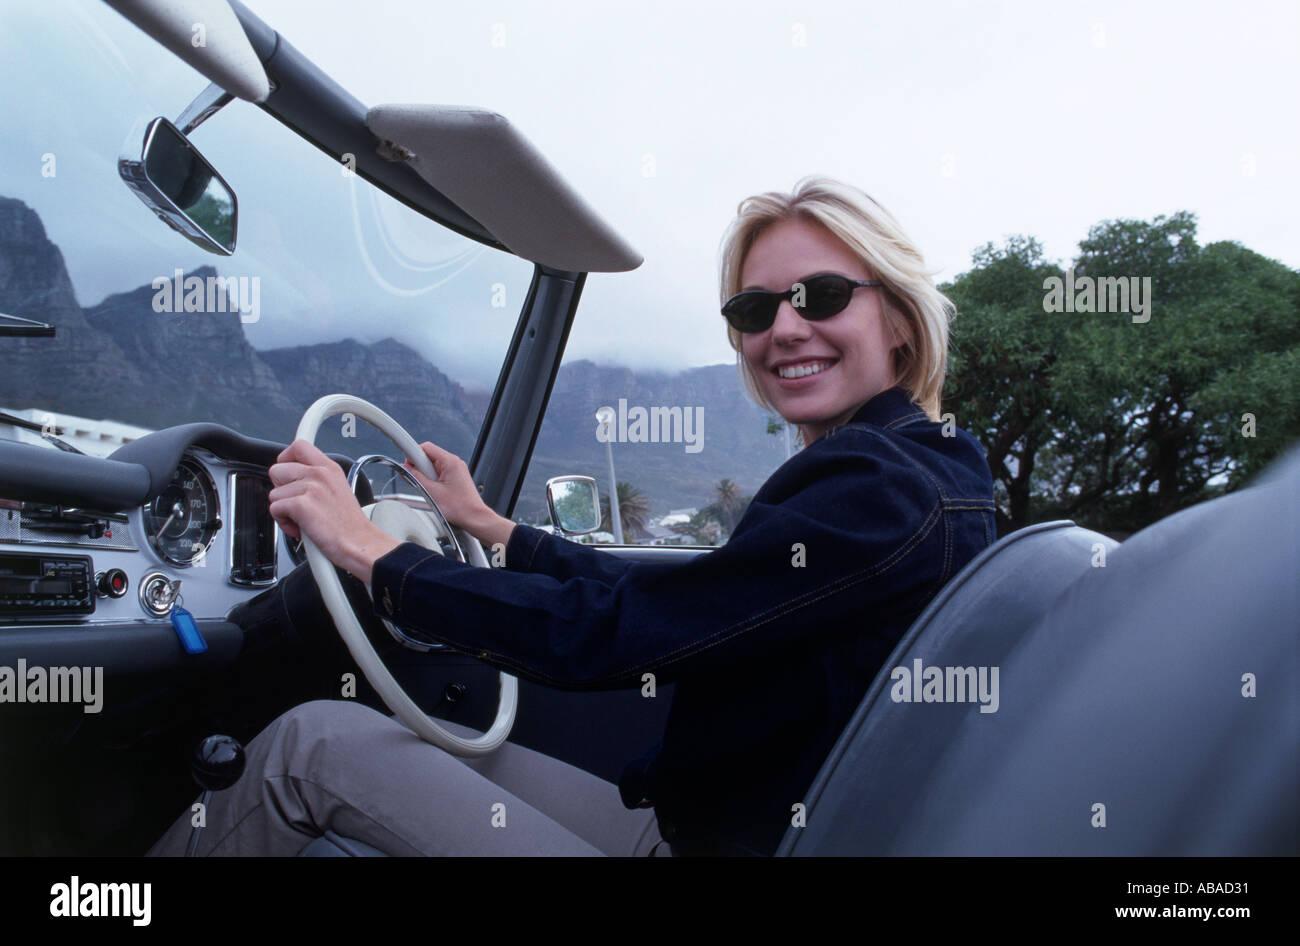 Girl driving car - Stock Image